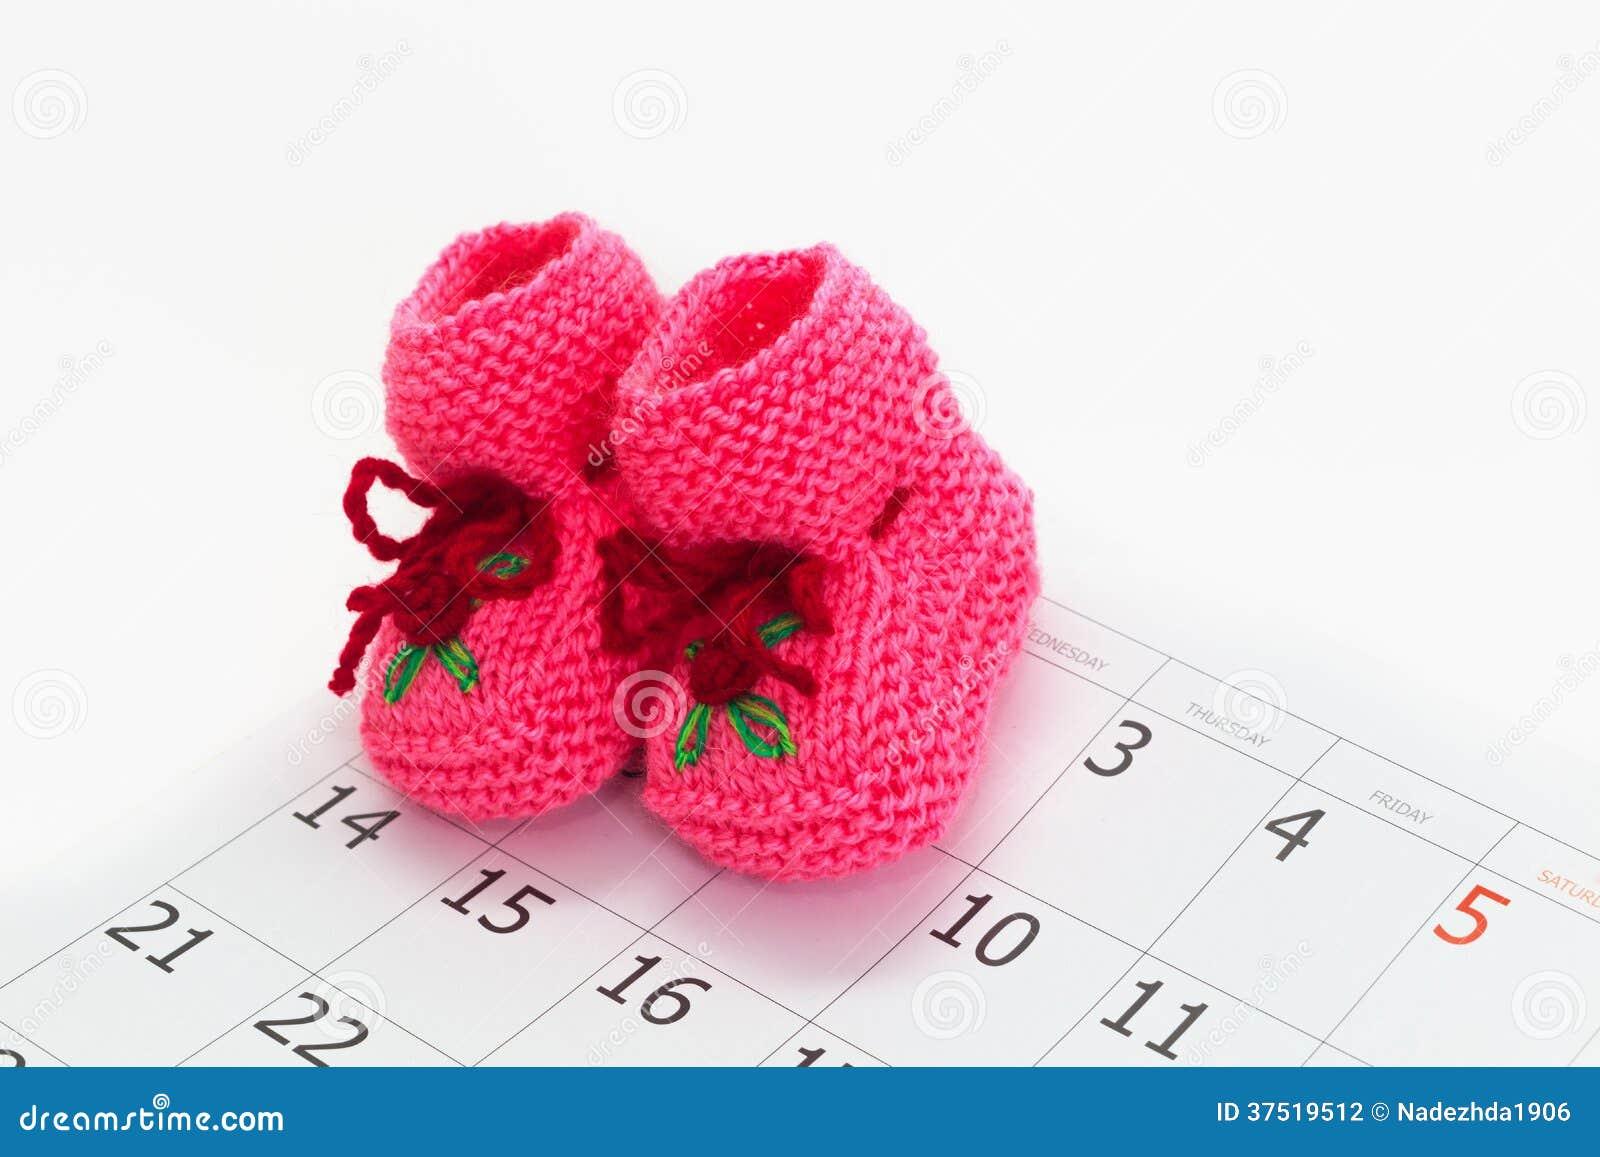 Baby due date calendar in Sydney